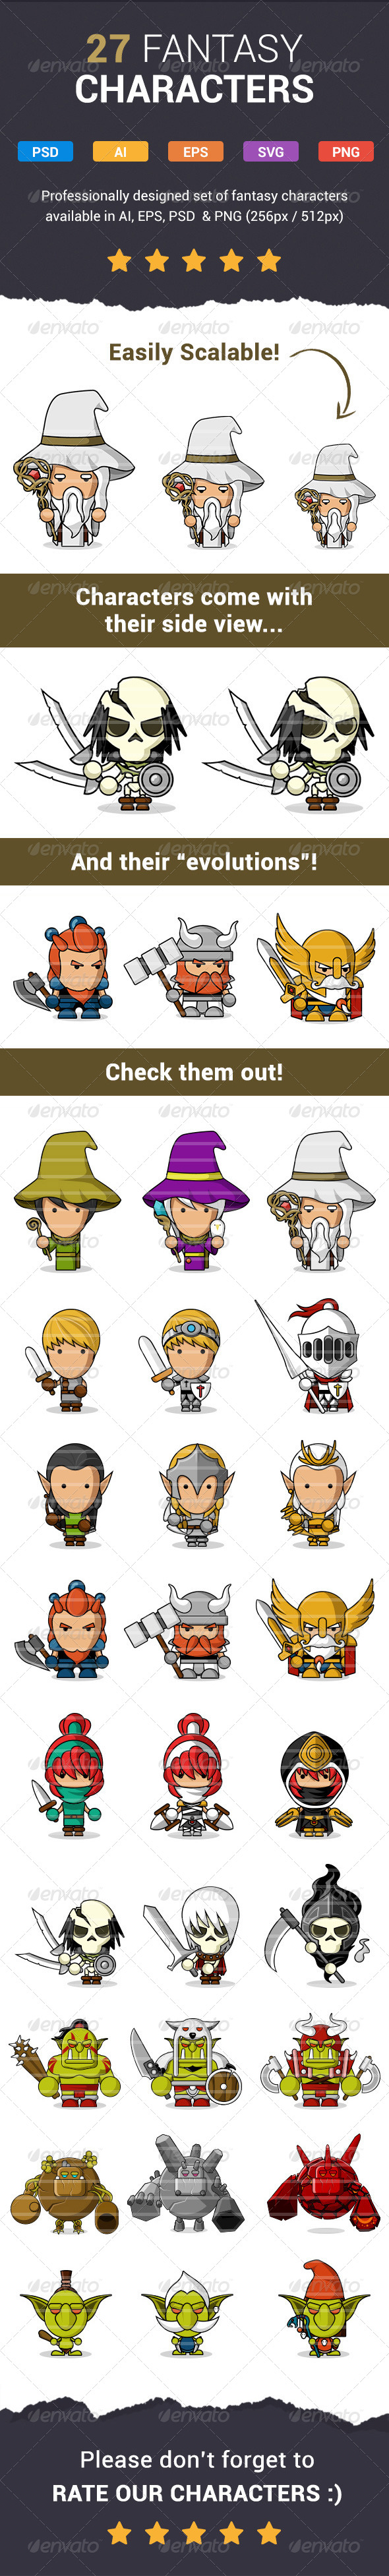 27 Modern Fantasy Characters - Characters Vectors